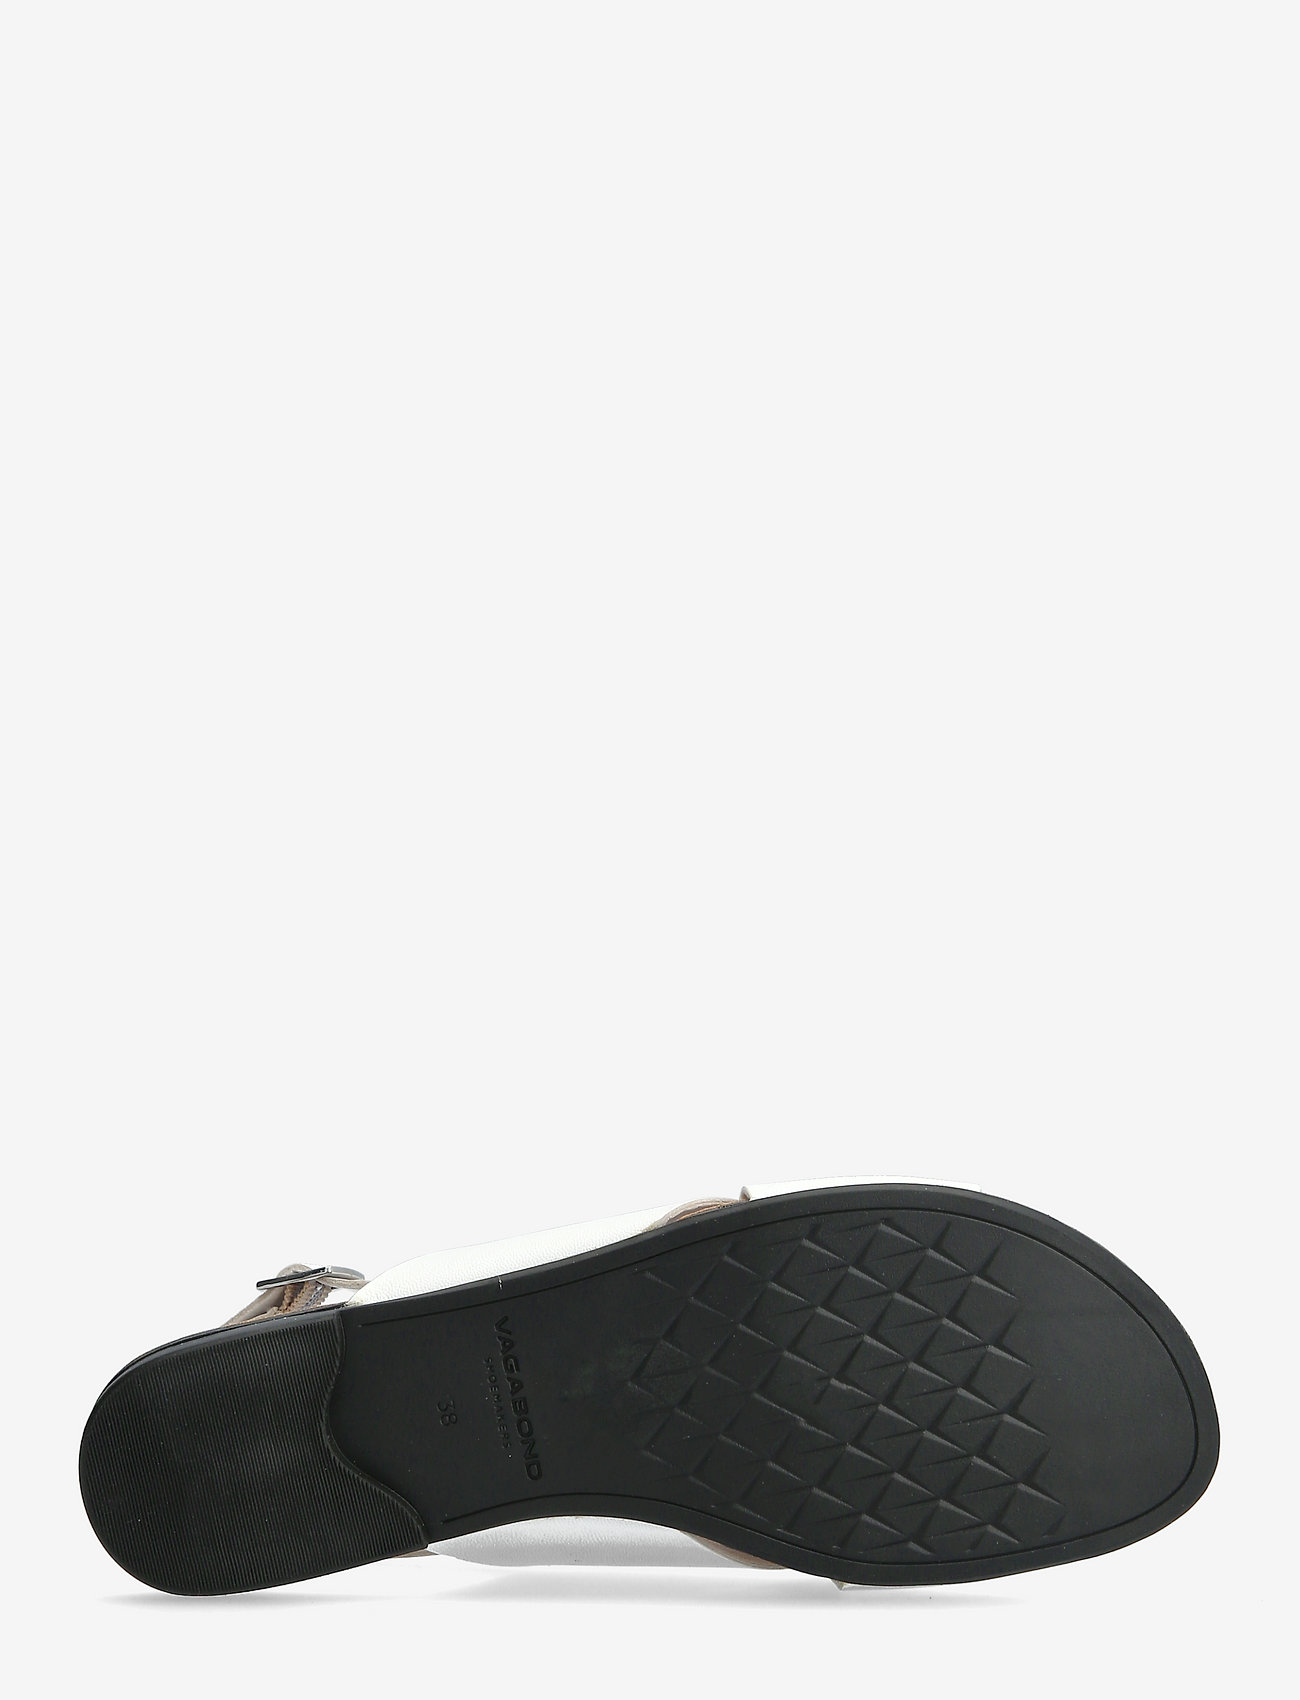 VAGABOND - TIA - płaskie sandały - white - 4